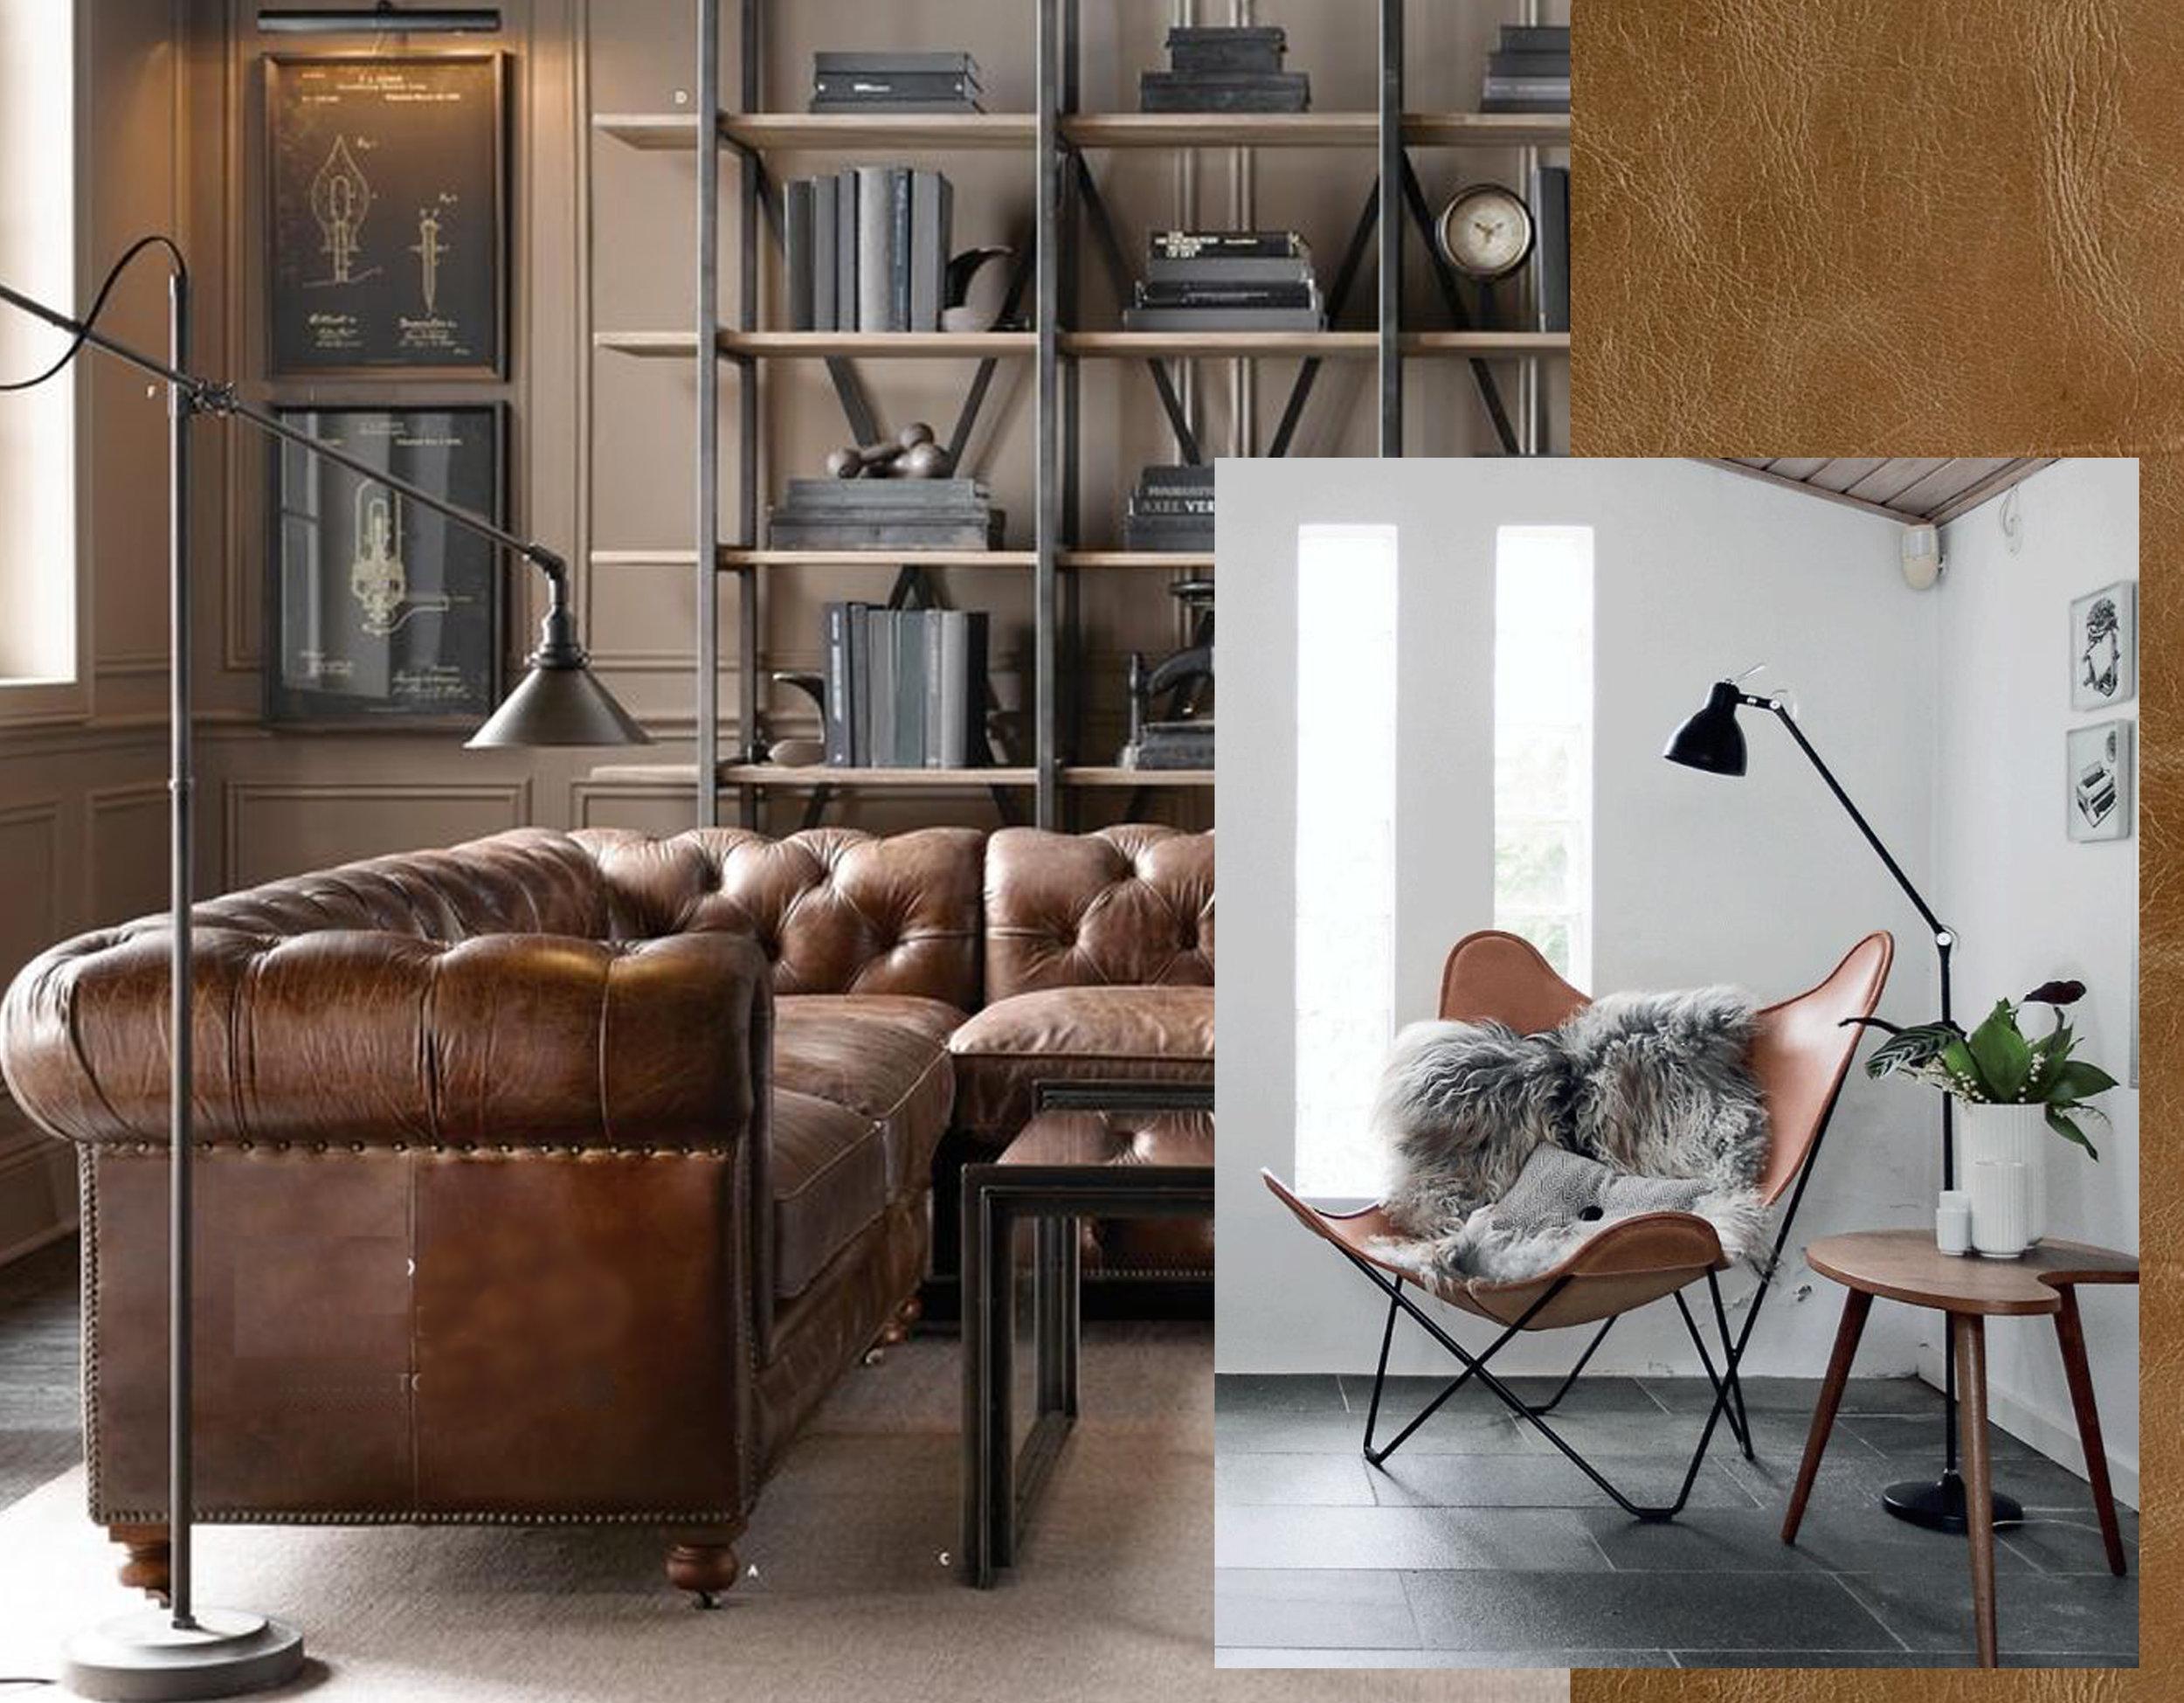 sofa  Restoration Hardware  - image Butterfly Chair via  Meubles la Fabrica